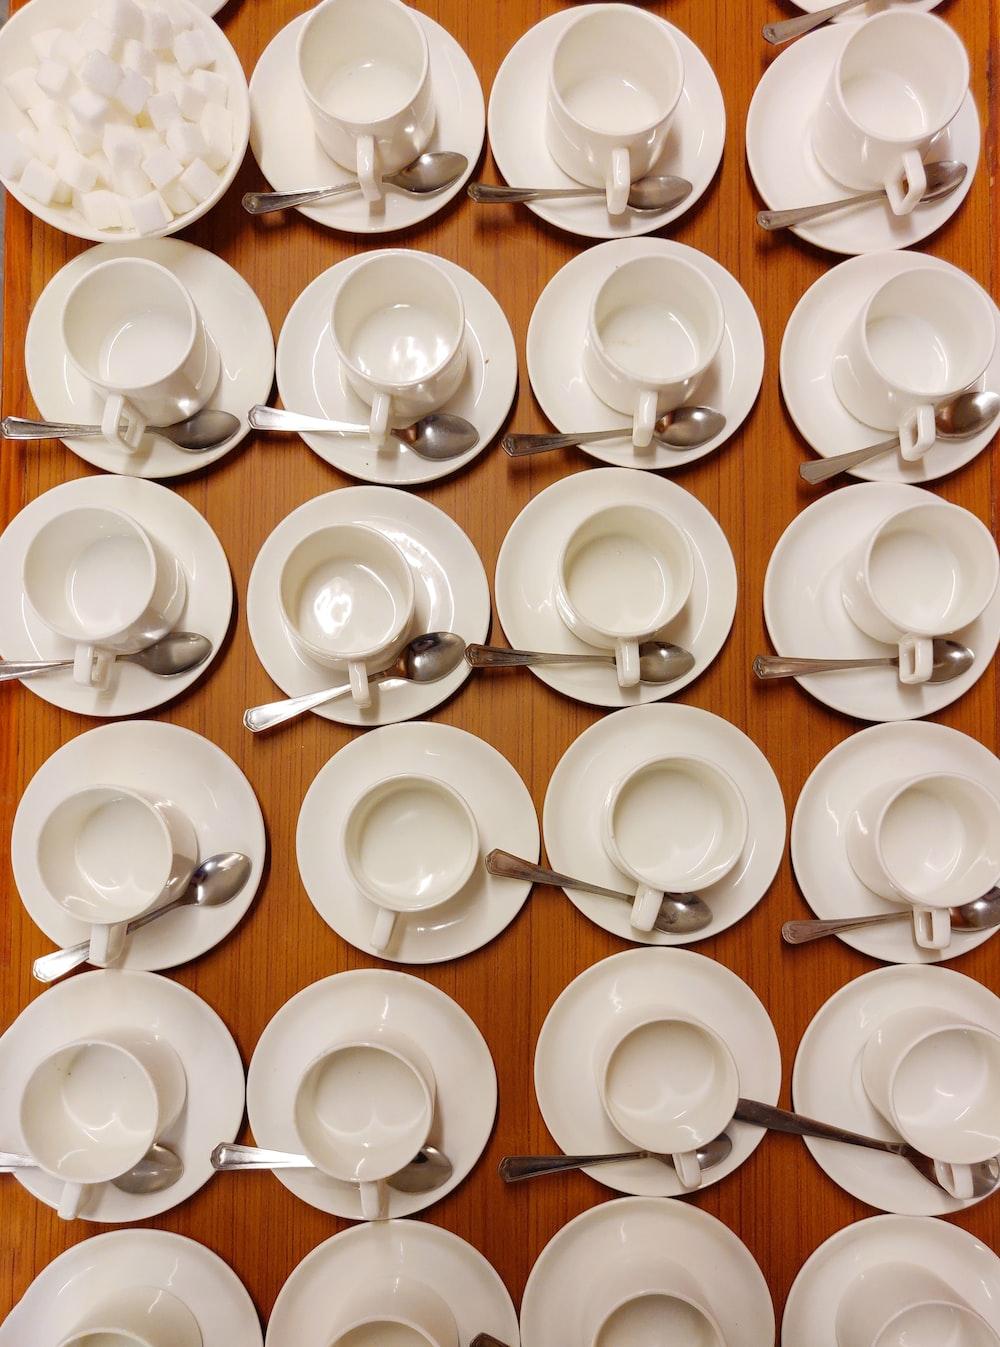 white ceramic teacup set on white ceramic saucer